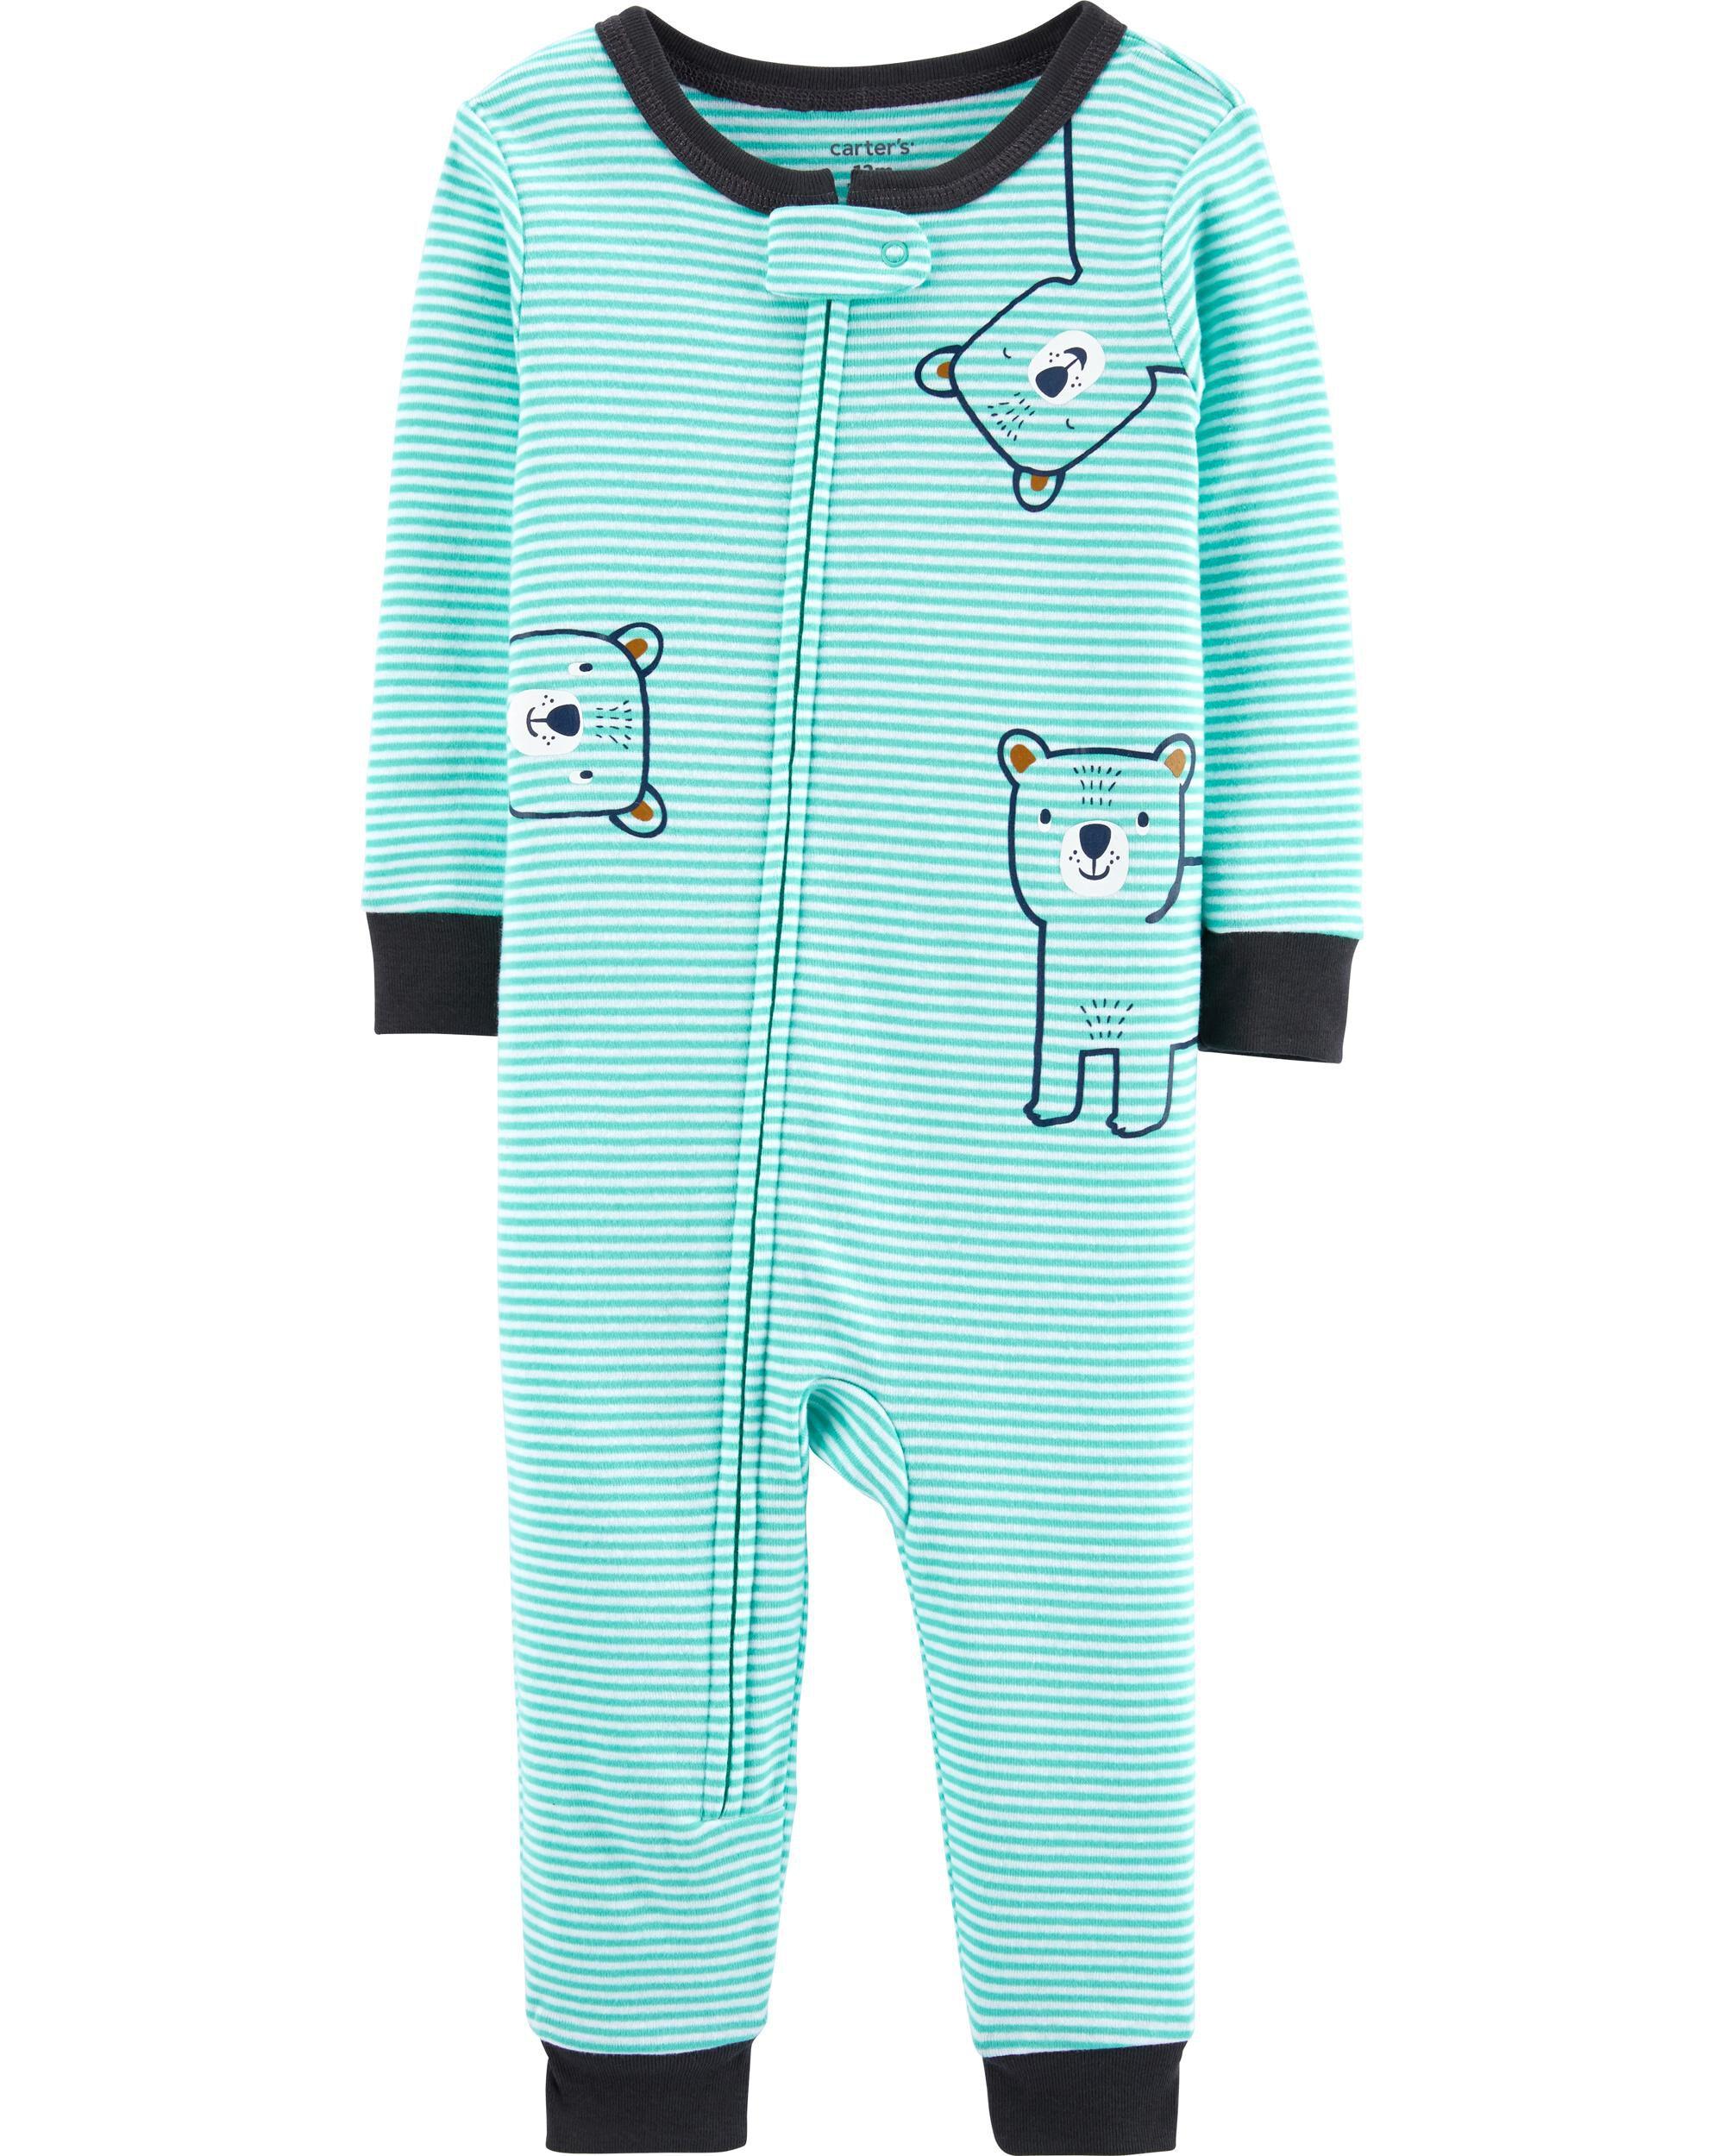 *CLEARANCE* 1-Piece Bear Snug Fit Cotton Footless PJs